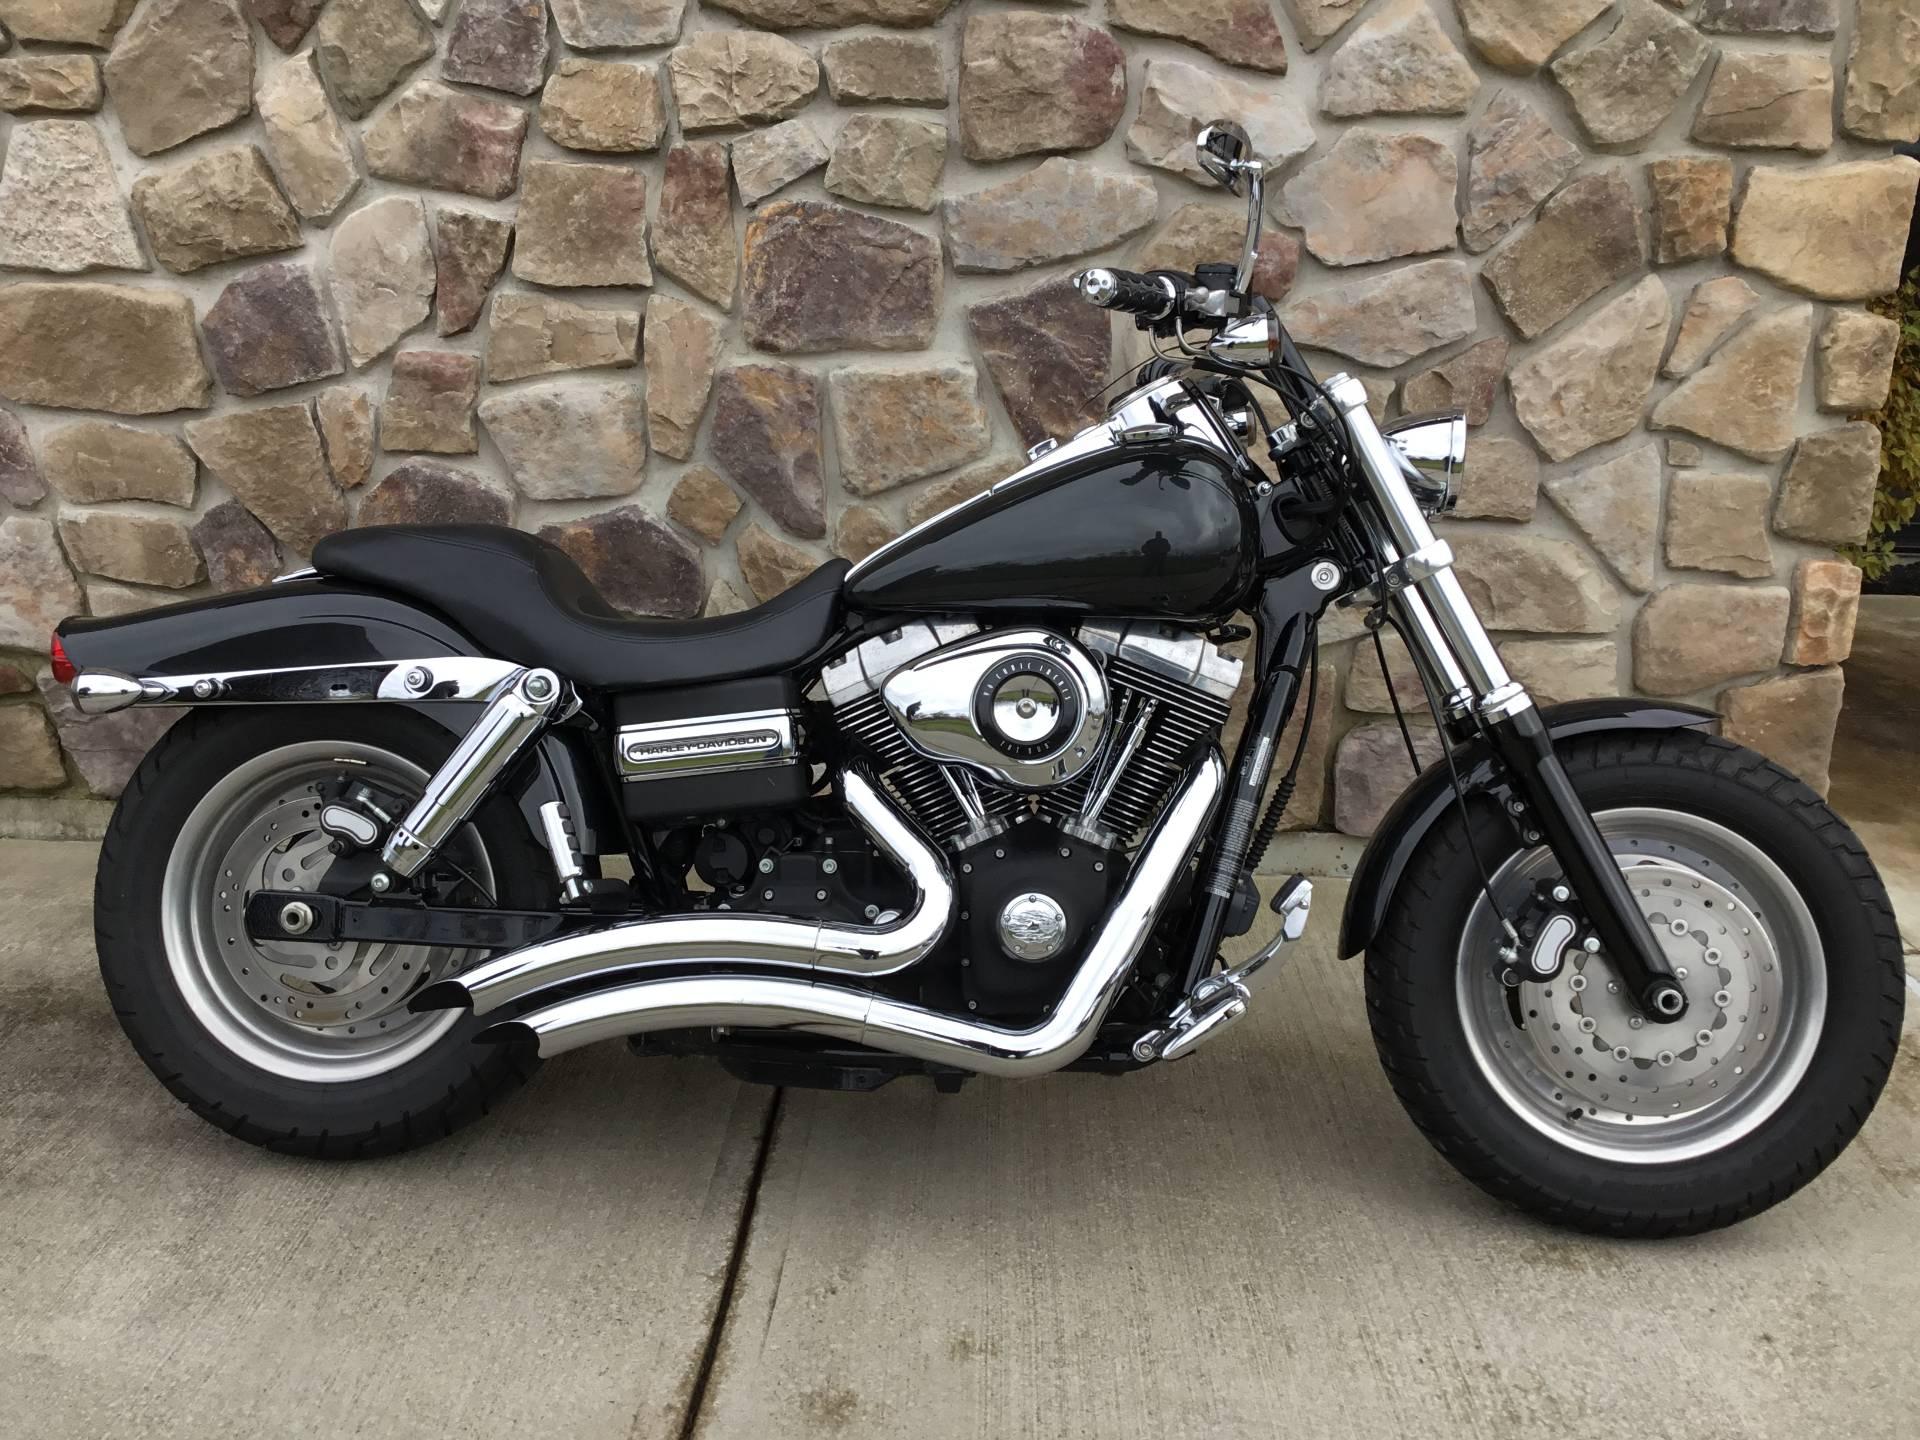 2008 Harley-Davidson Dyna® Fat Bob™ in Broadalbin, New York